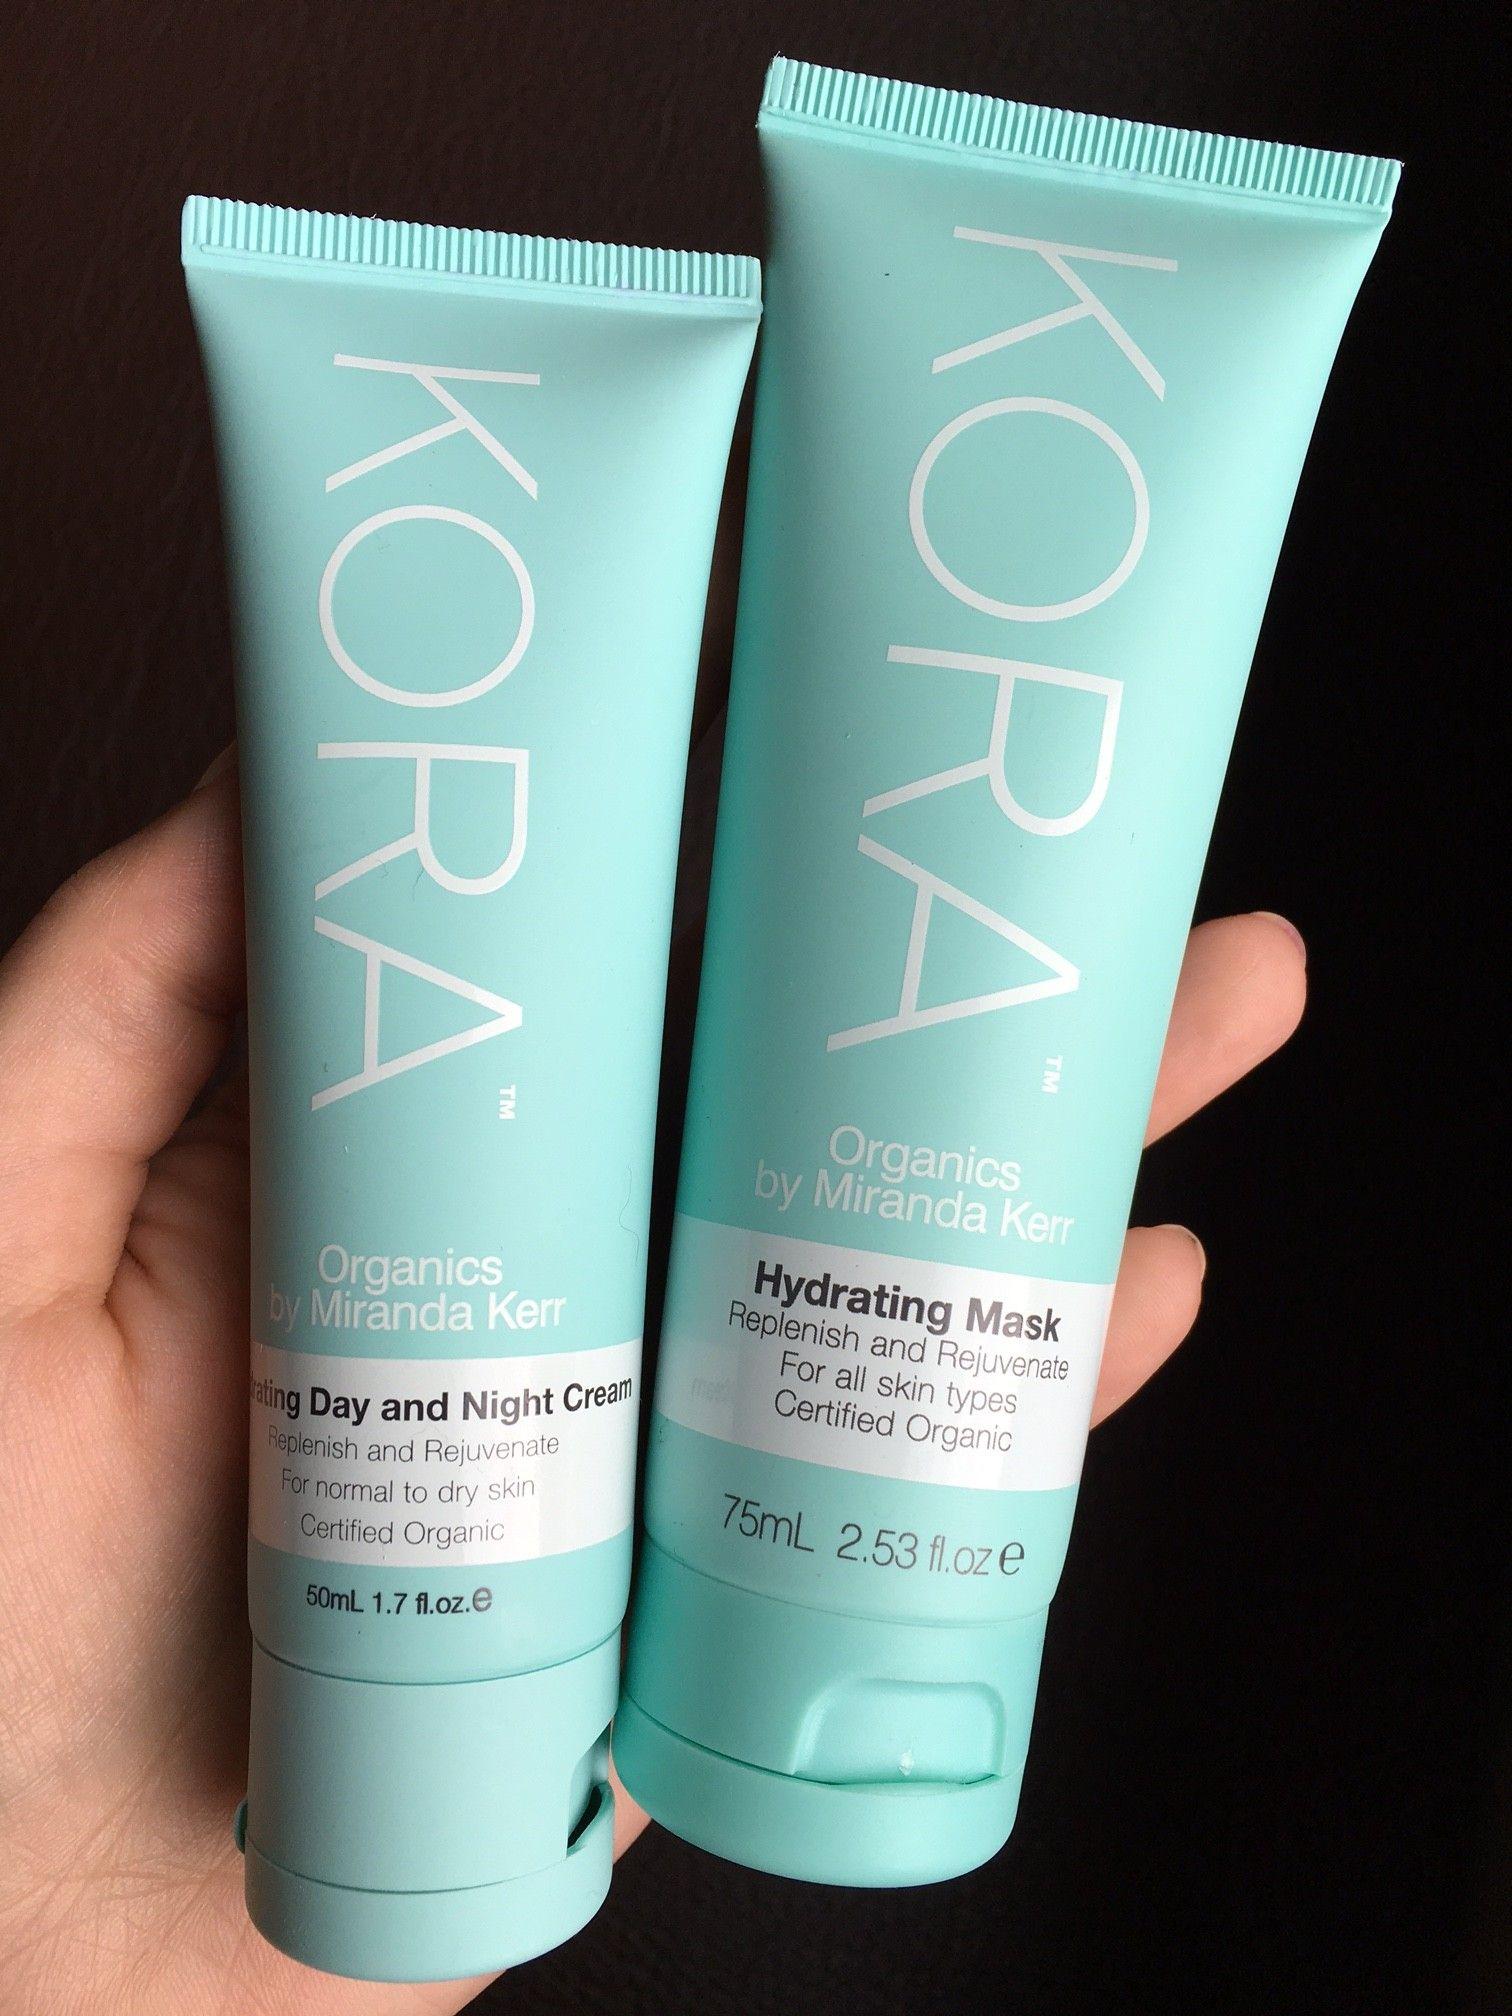 KORA Organics by Miranda Kerr Skincare Review Vegan